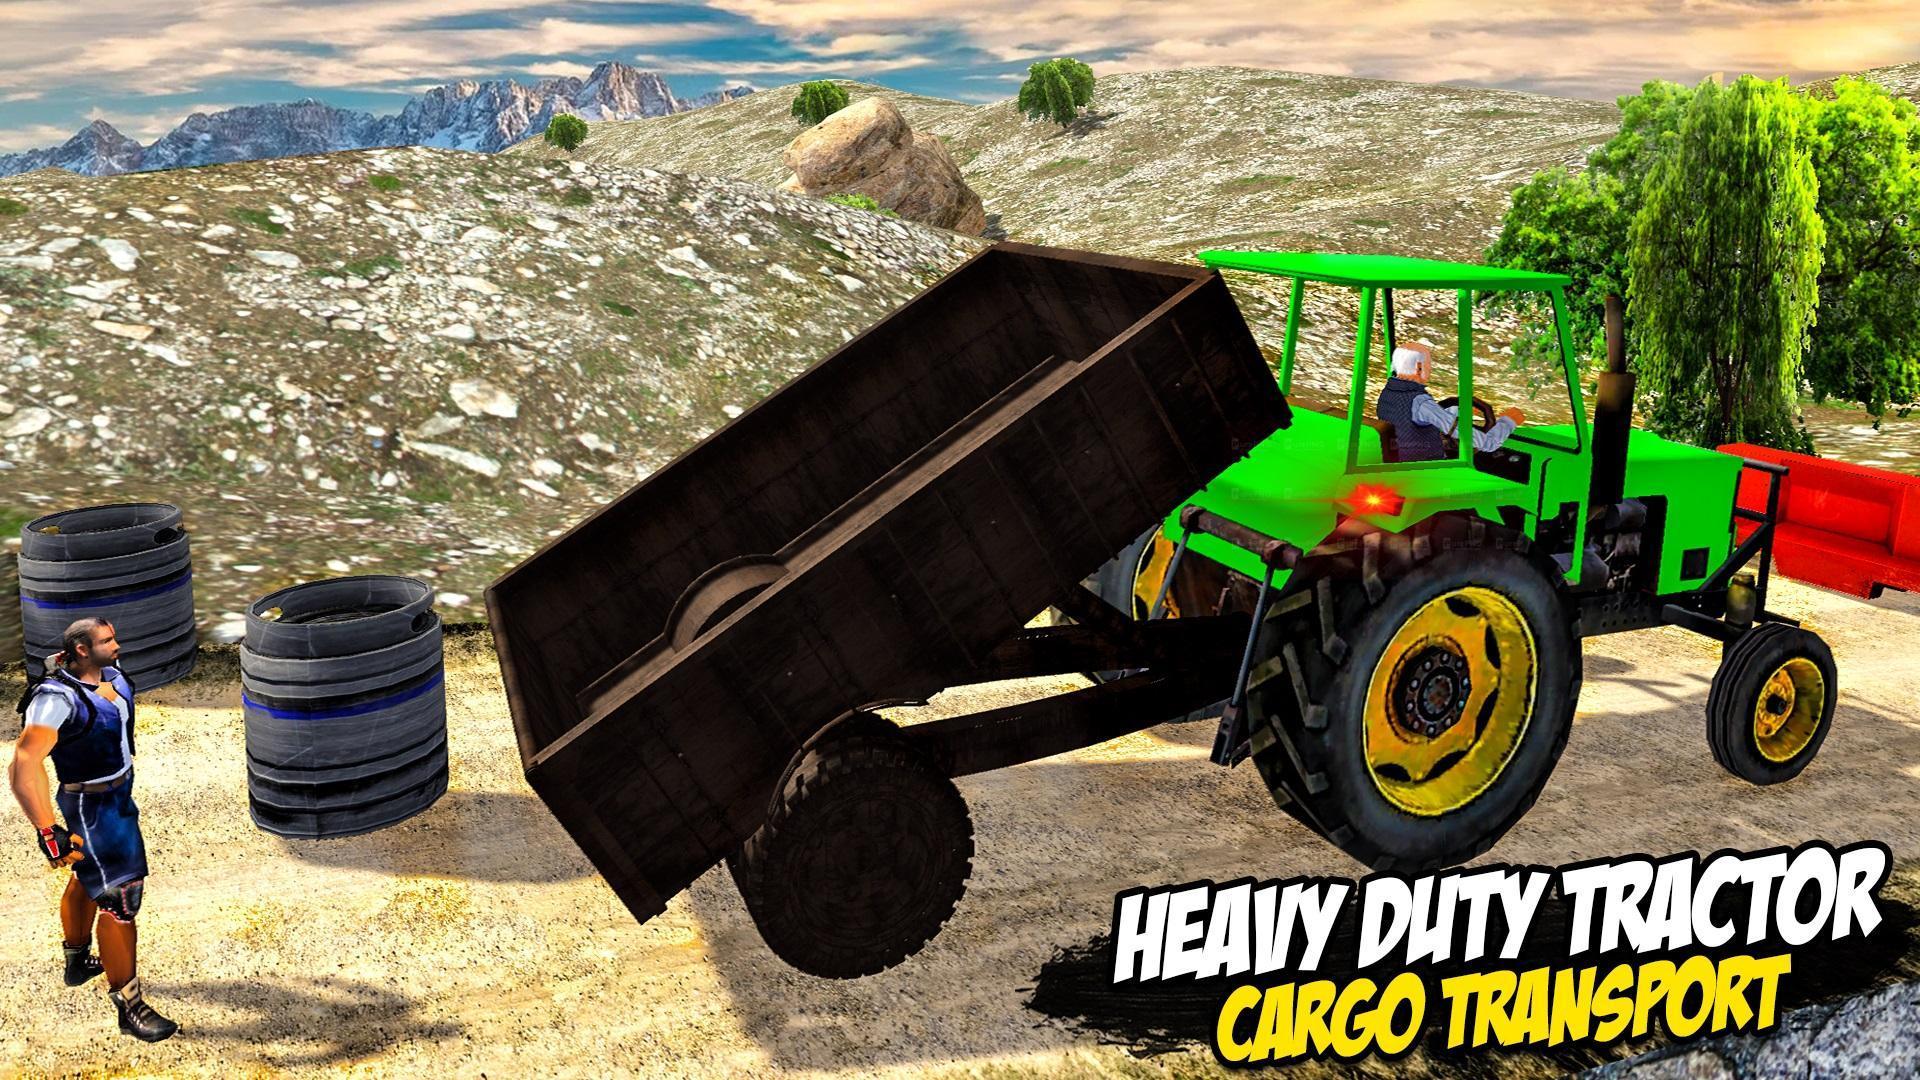 Heavy Tractor Trolley: Tractor Cargo Simulator🚜🚜 3.1 Screenshot 14